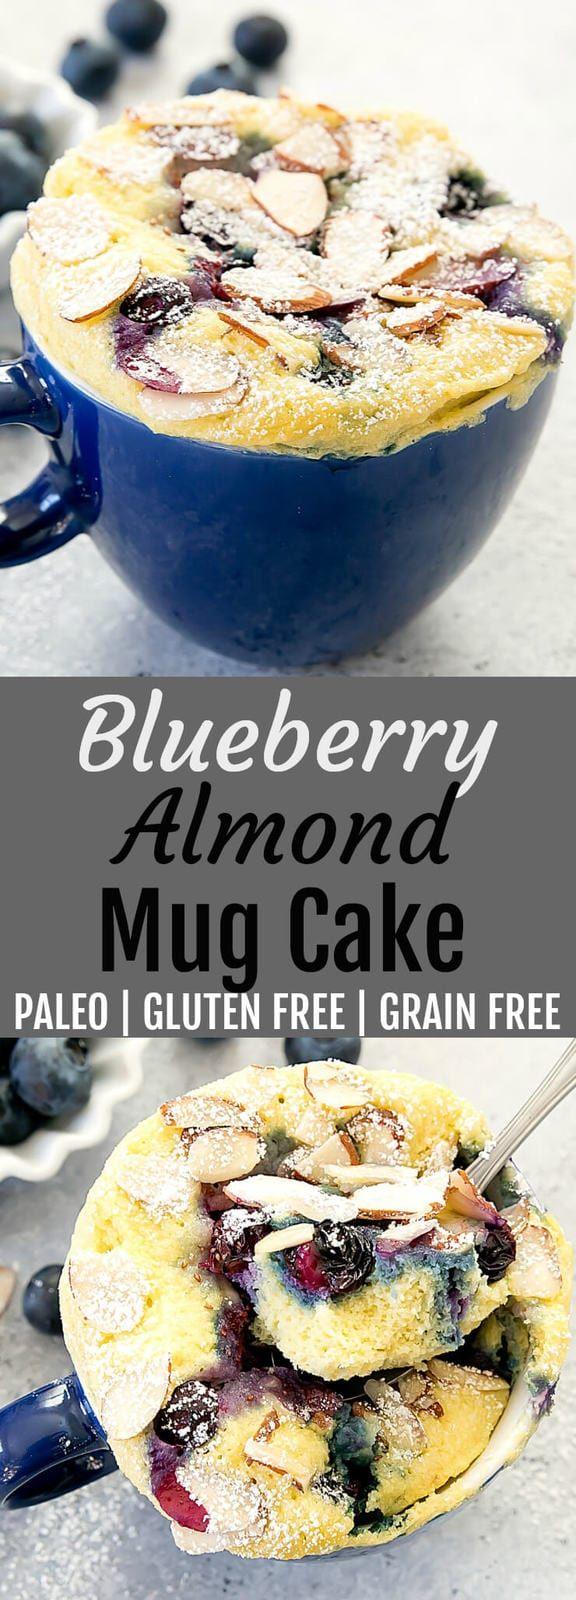 Blueberry Almond Mug Cake. Gluten free, wheat flour free and paleo. This fluffy …